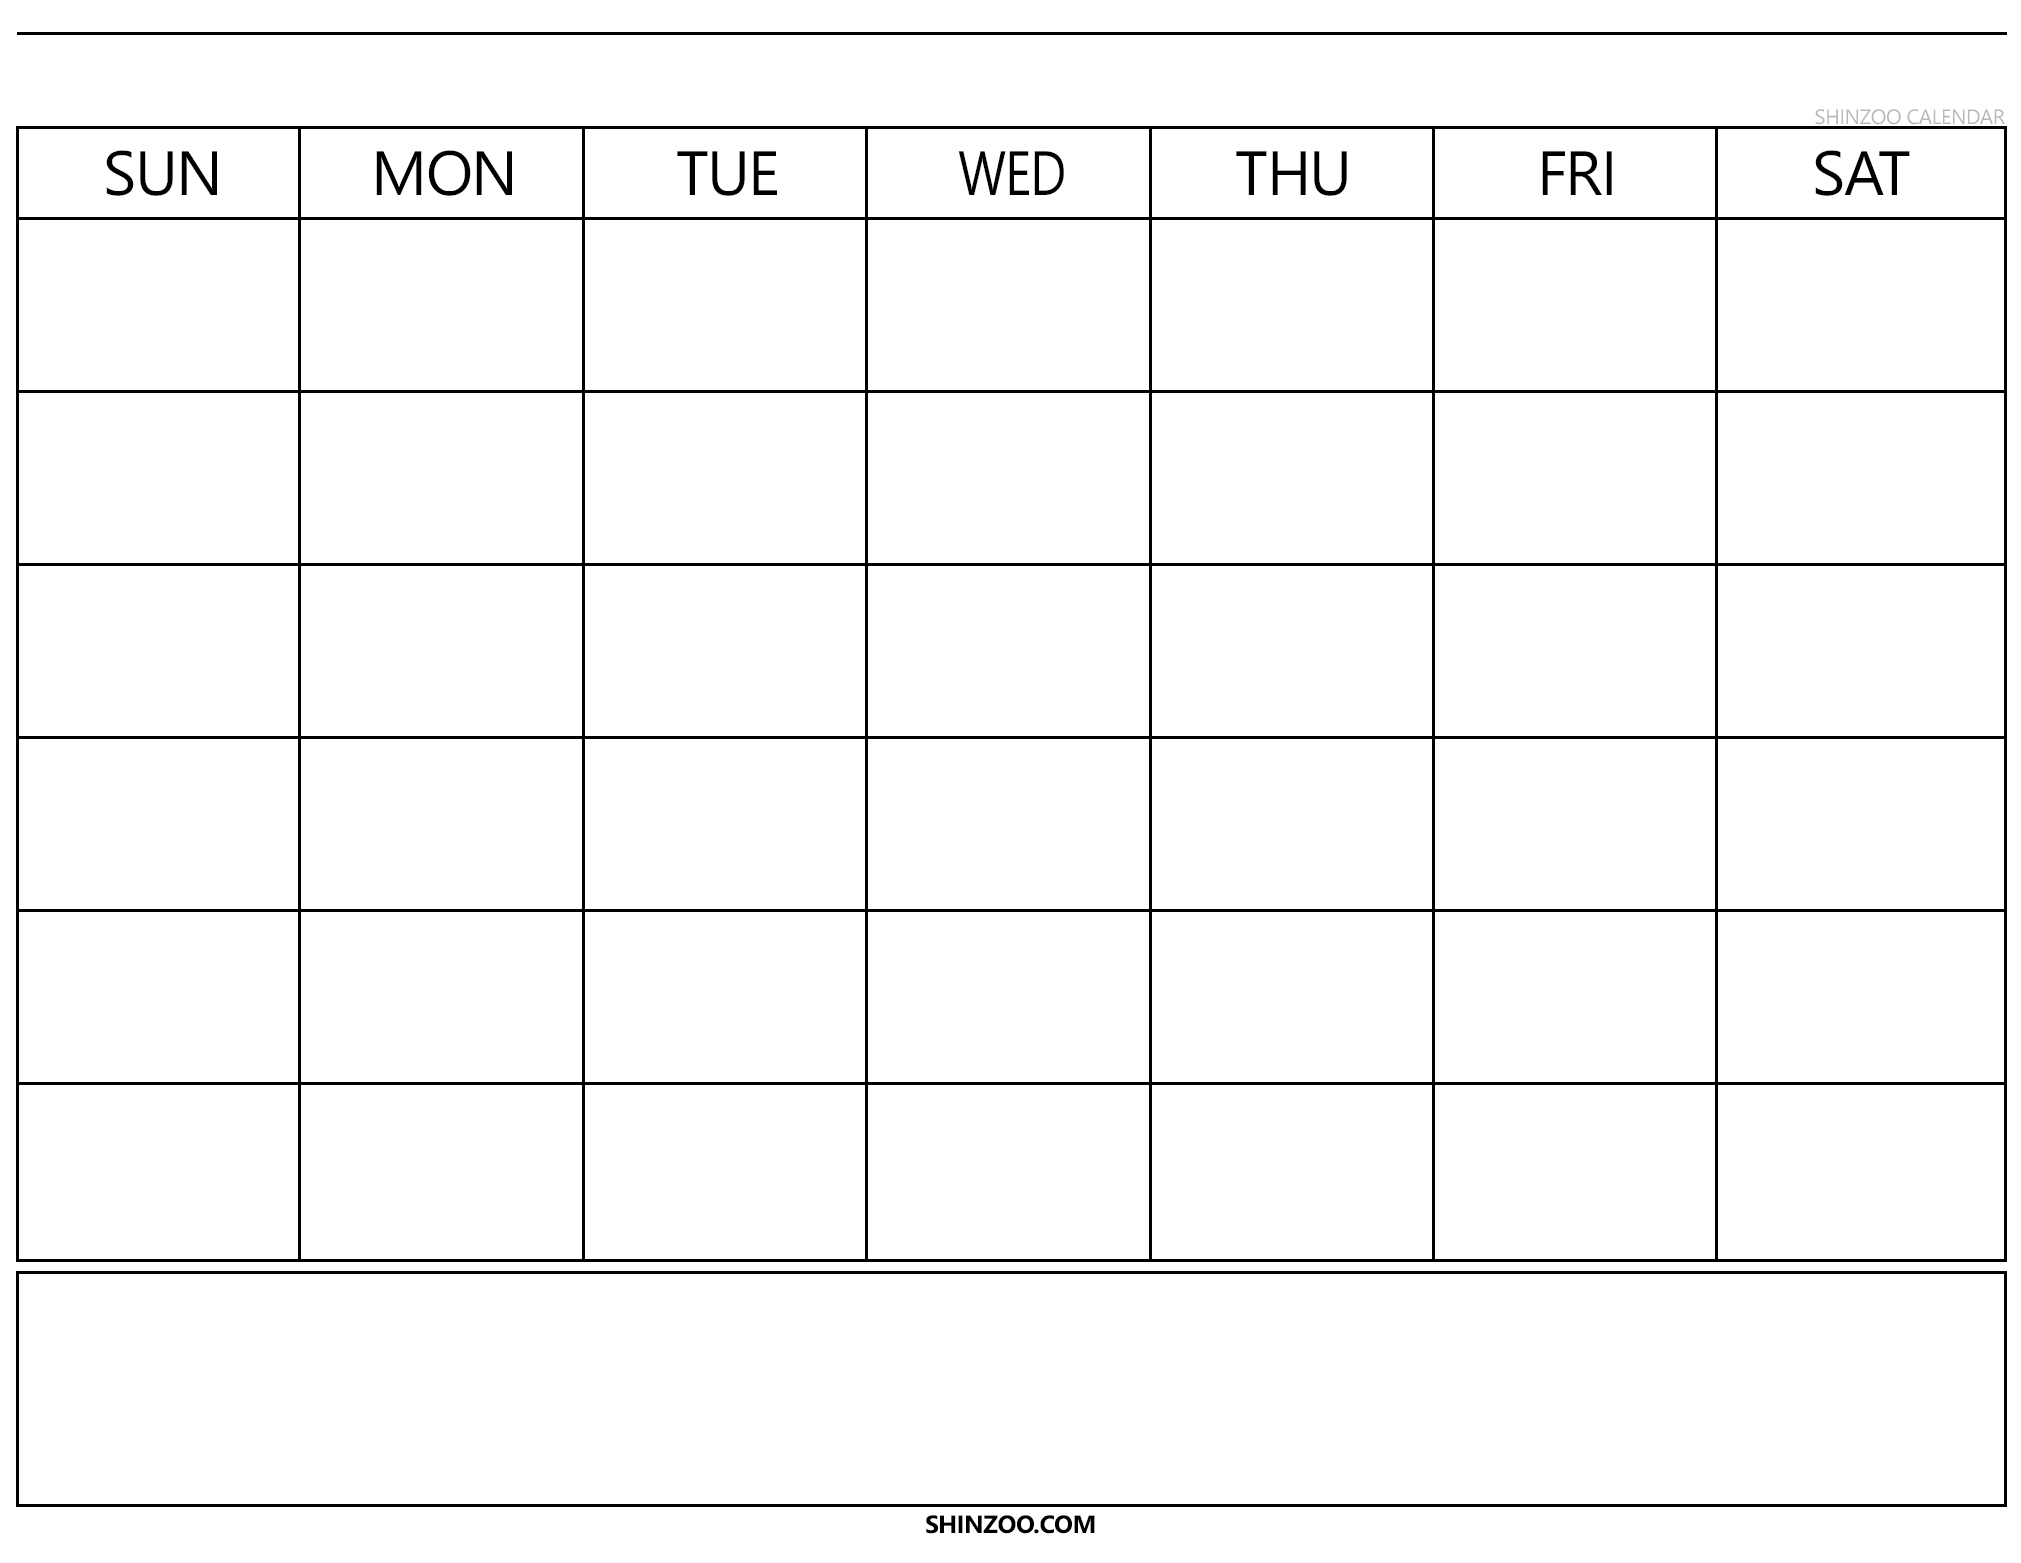 Blank Calendar Template 2019 2020 Printable in Blank Calendar 2019 2020 To Fill In